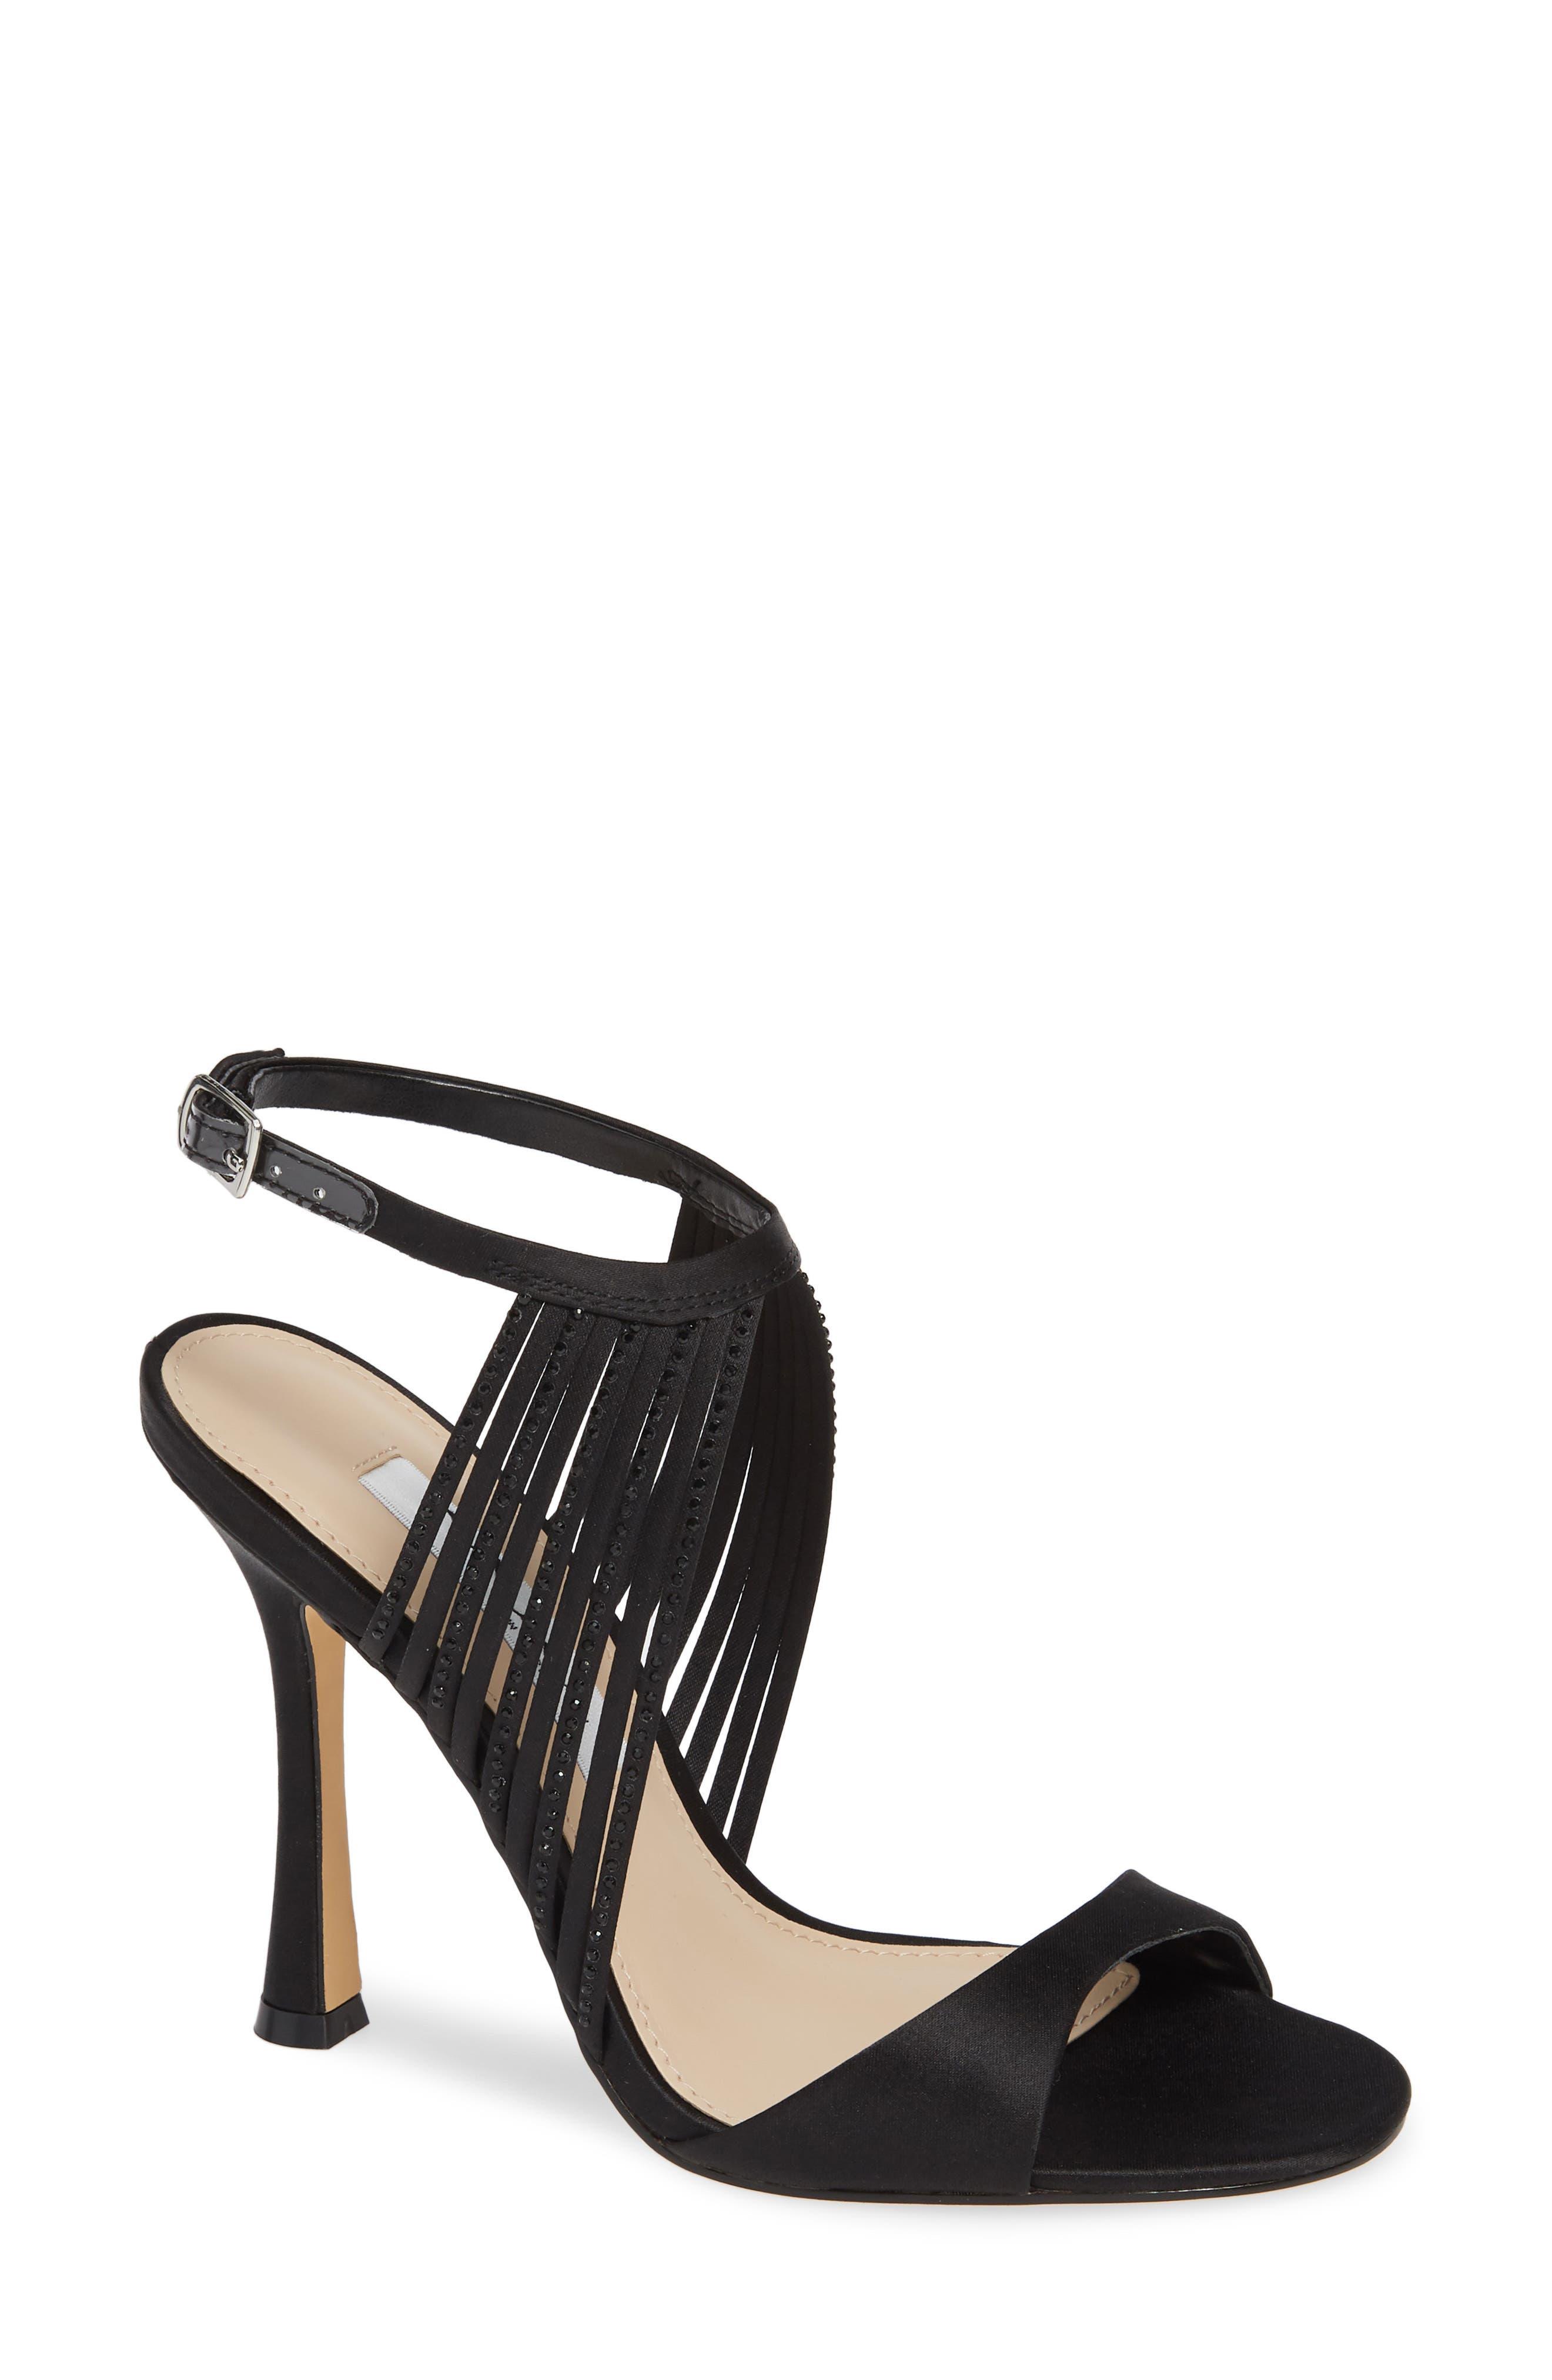 Damaris Crystal Embellished Sandal,                             Main thumbnail 1, color,                             BLACK SATIN